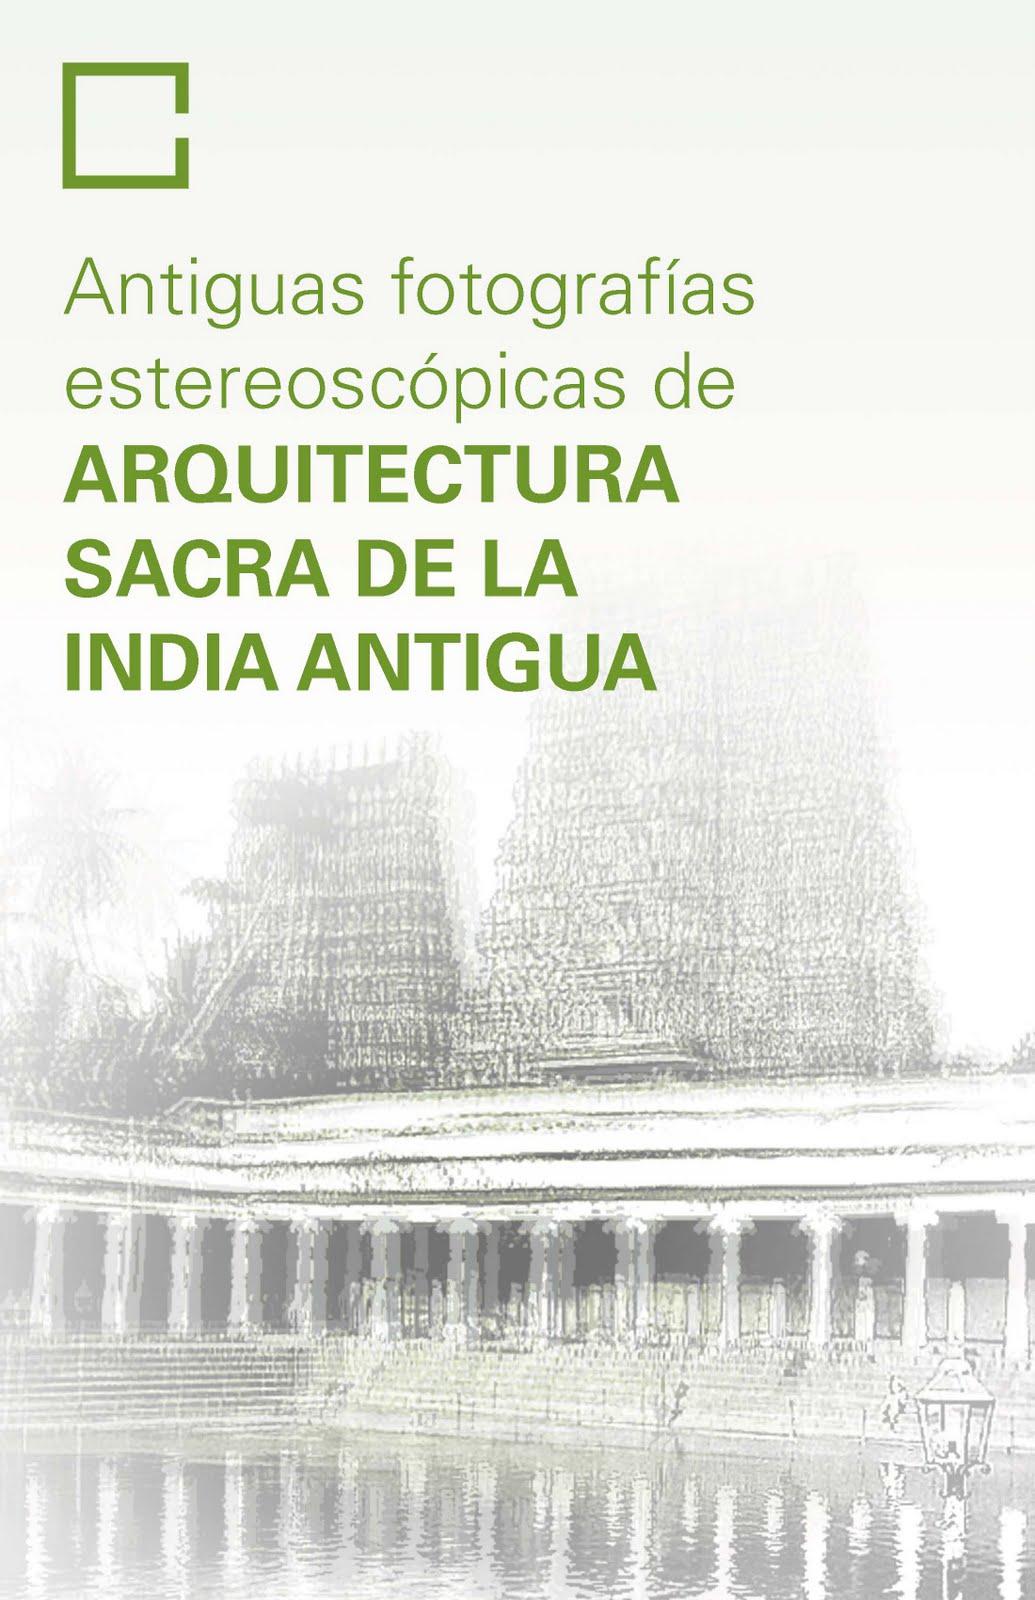 Recomendaciones facdearq facdearq for Arquitectura sacro